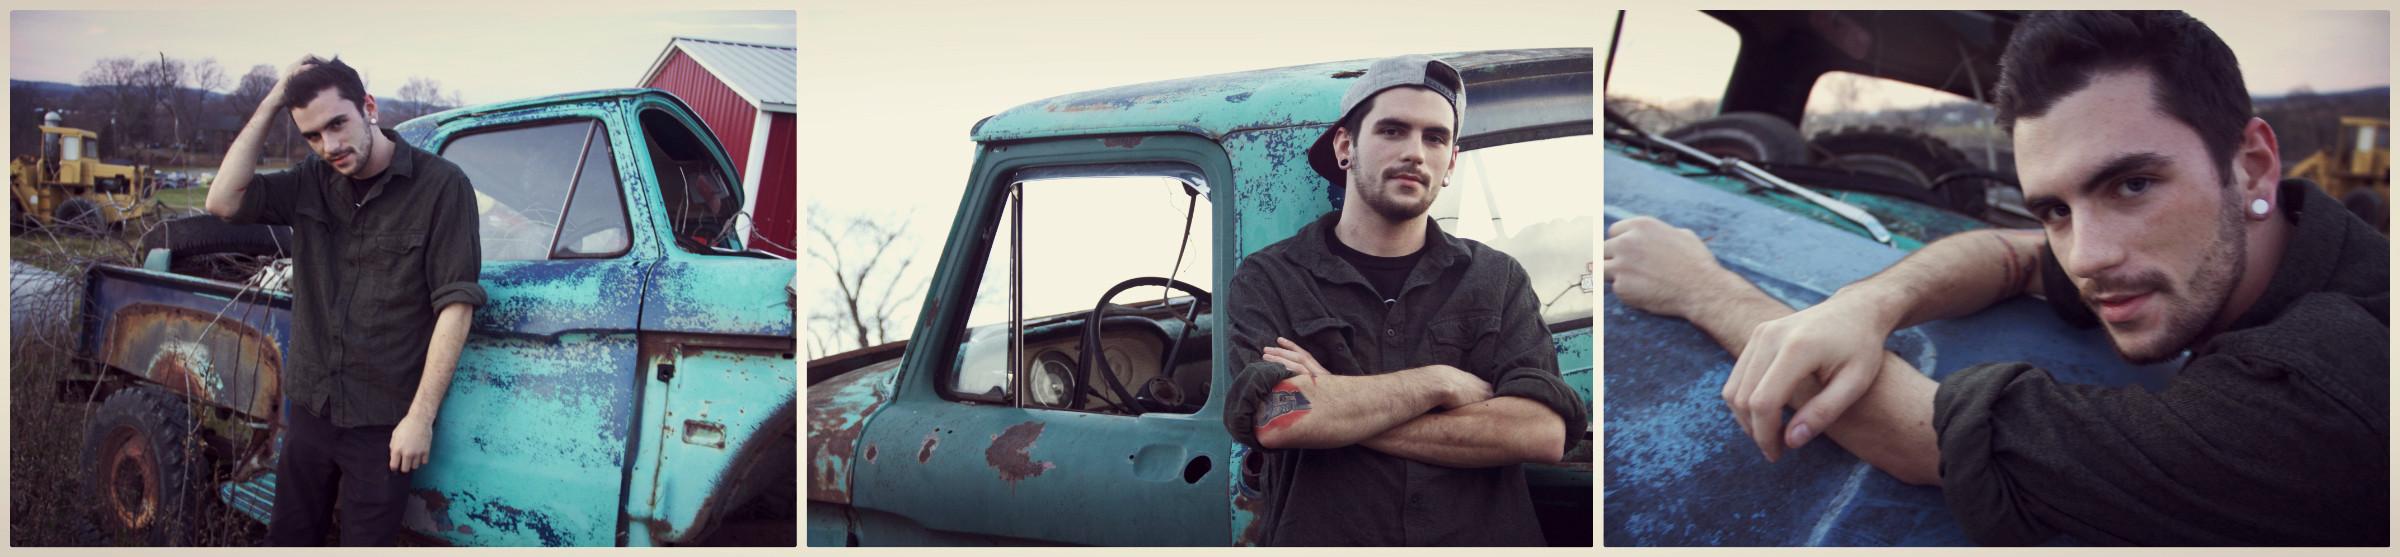 michael_ford_truck.jpg